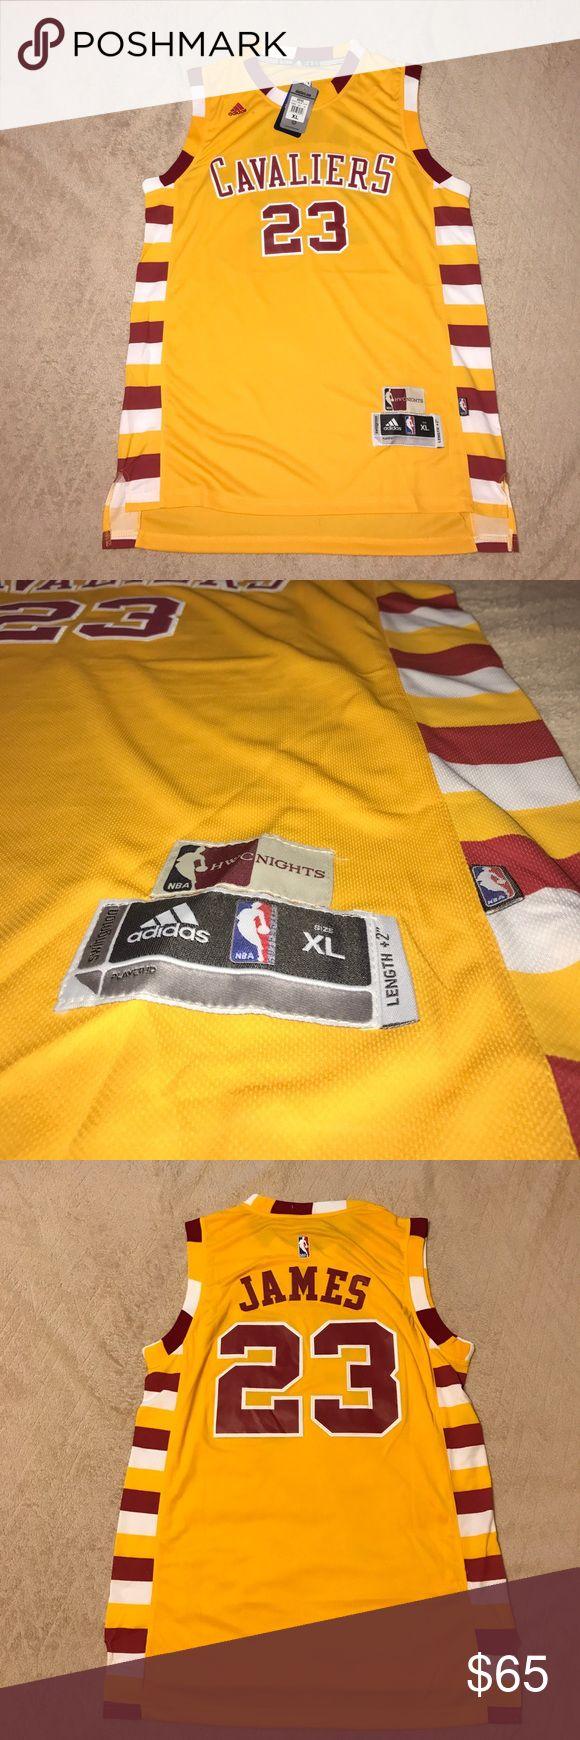 Selling this Lebron James Cleveland Cavaliers on Poshmark! My username is: annaksparks. #shopmycloset #poshmark #fashion #shopping #style #forsale #nba #Other